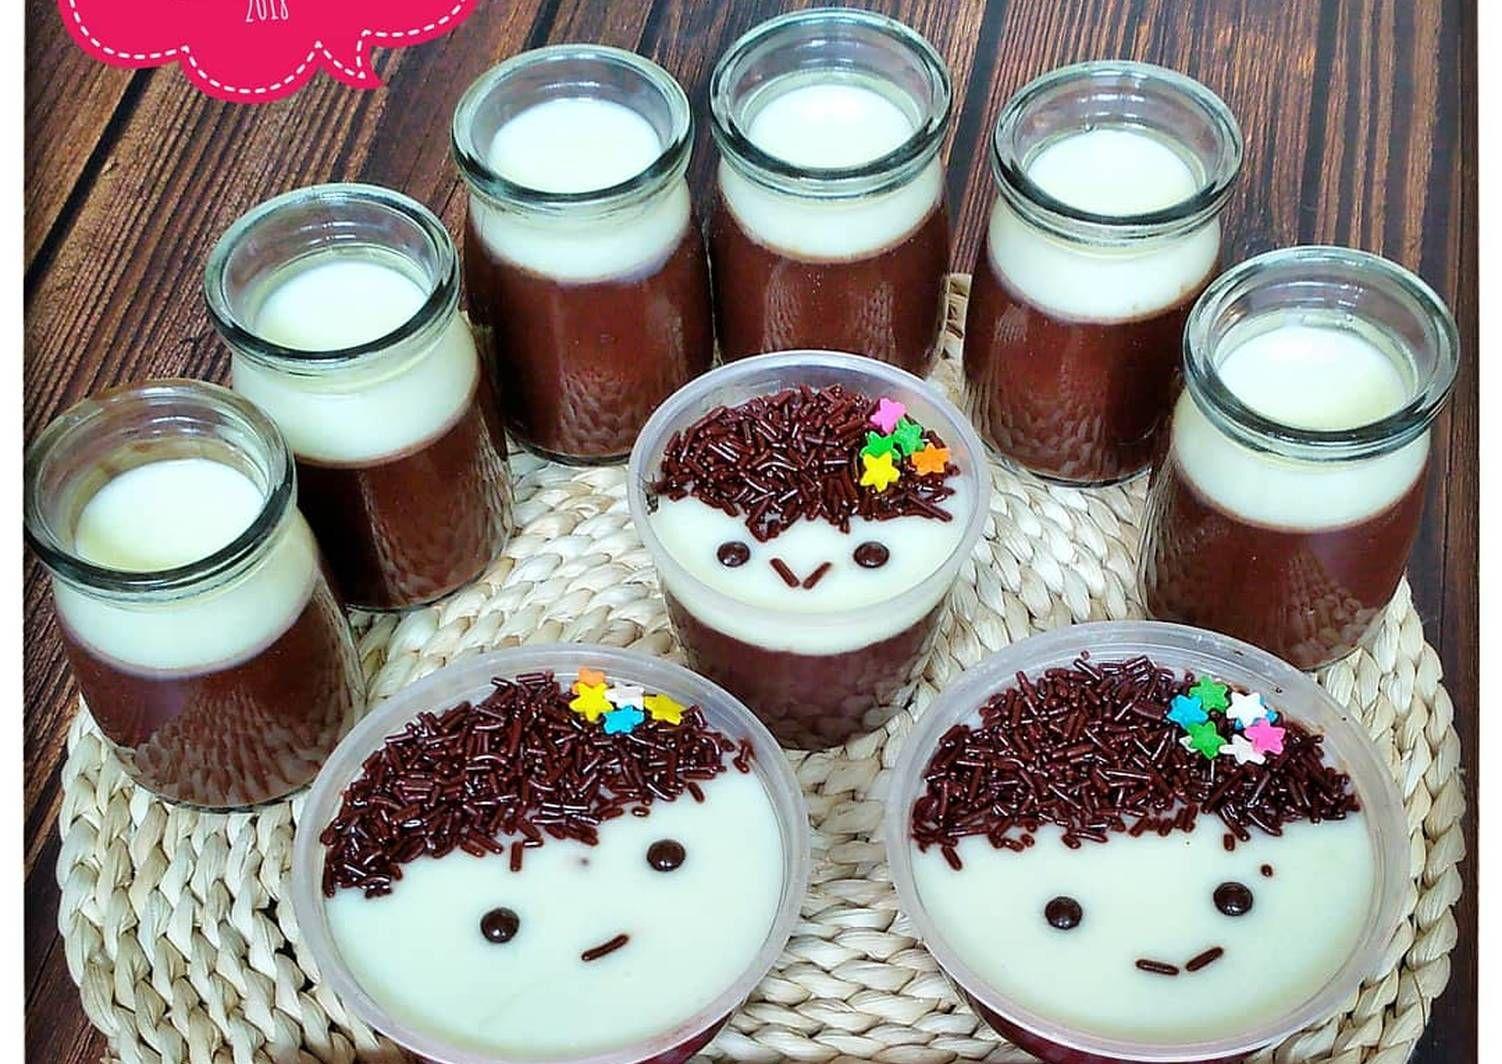 Resep Silky Puding Coklat Puding Kribo Oleh Susan Mellyani Resep Puding Coklat Resep Makanan Penutup Coklat